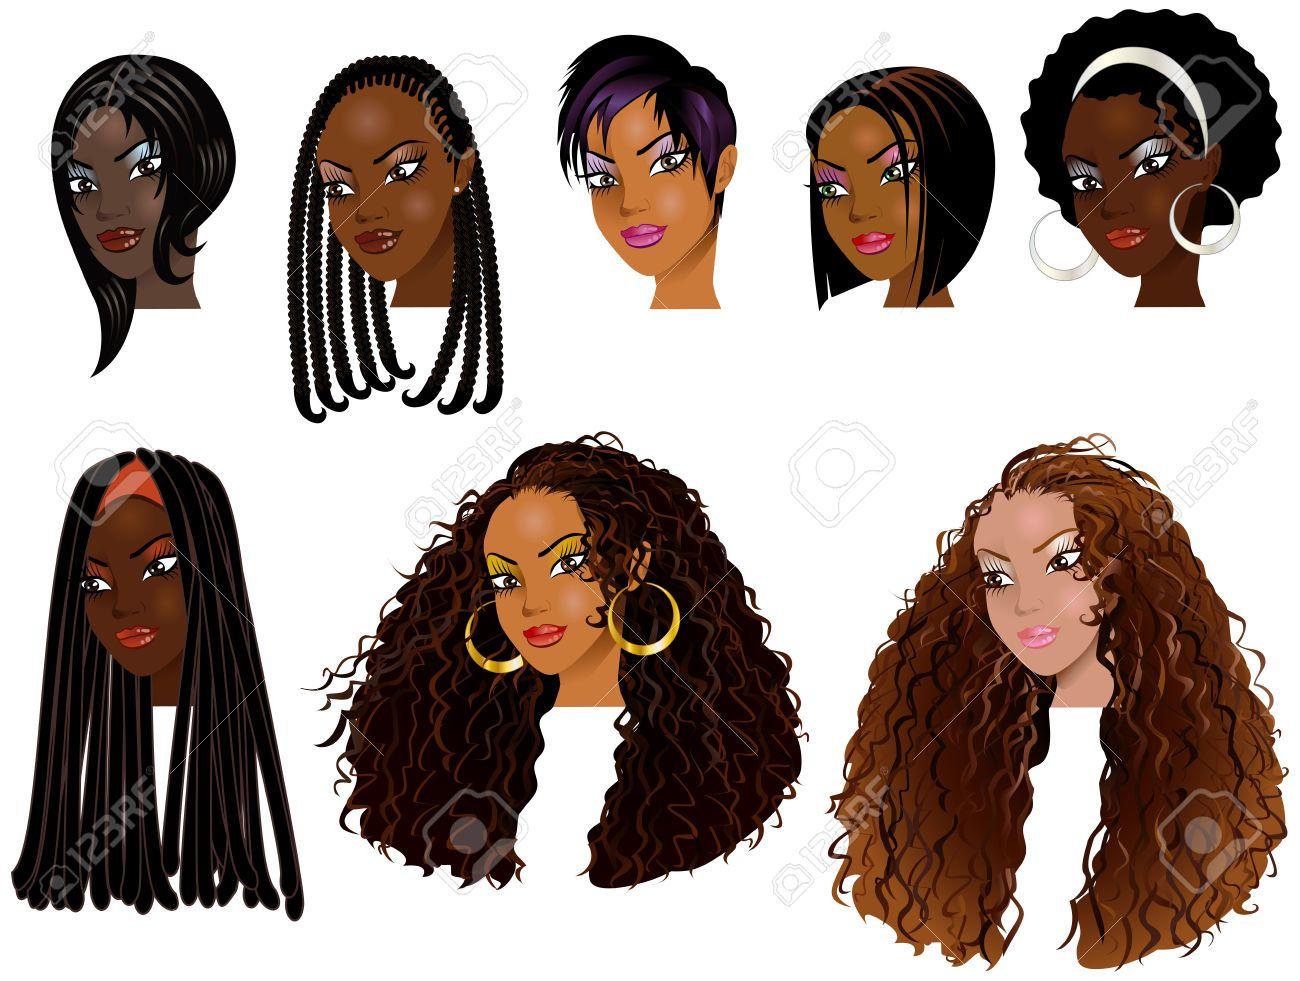 Belleza africana para chico afortunado - 1 part 3